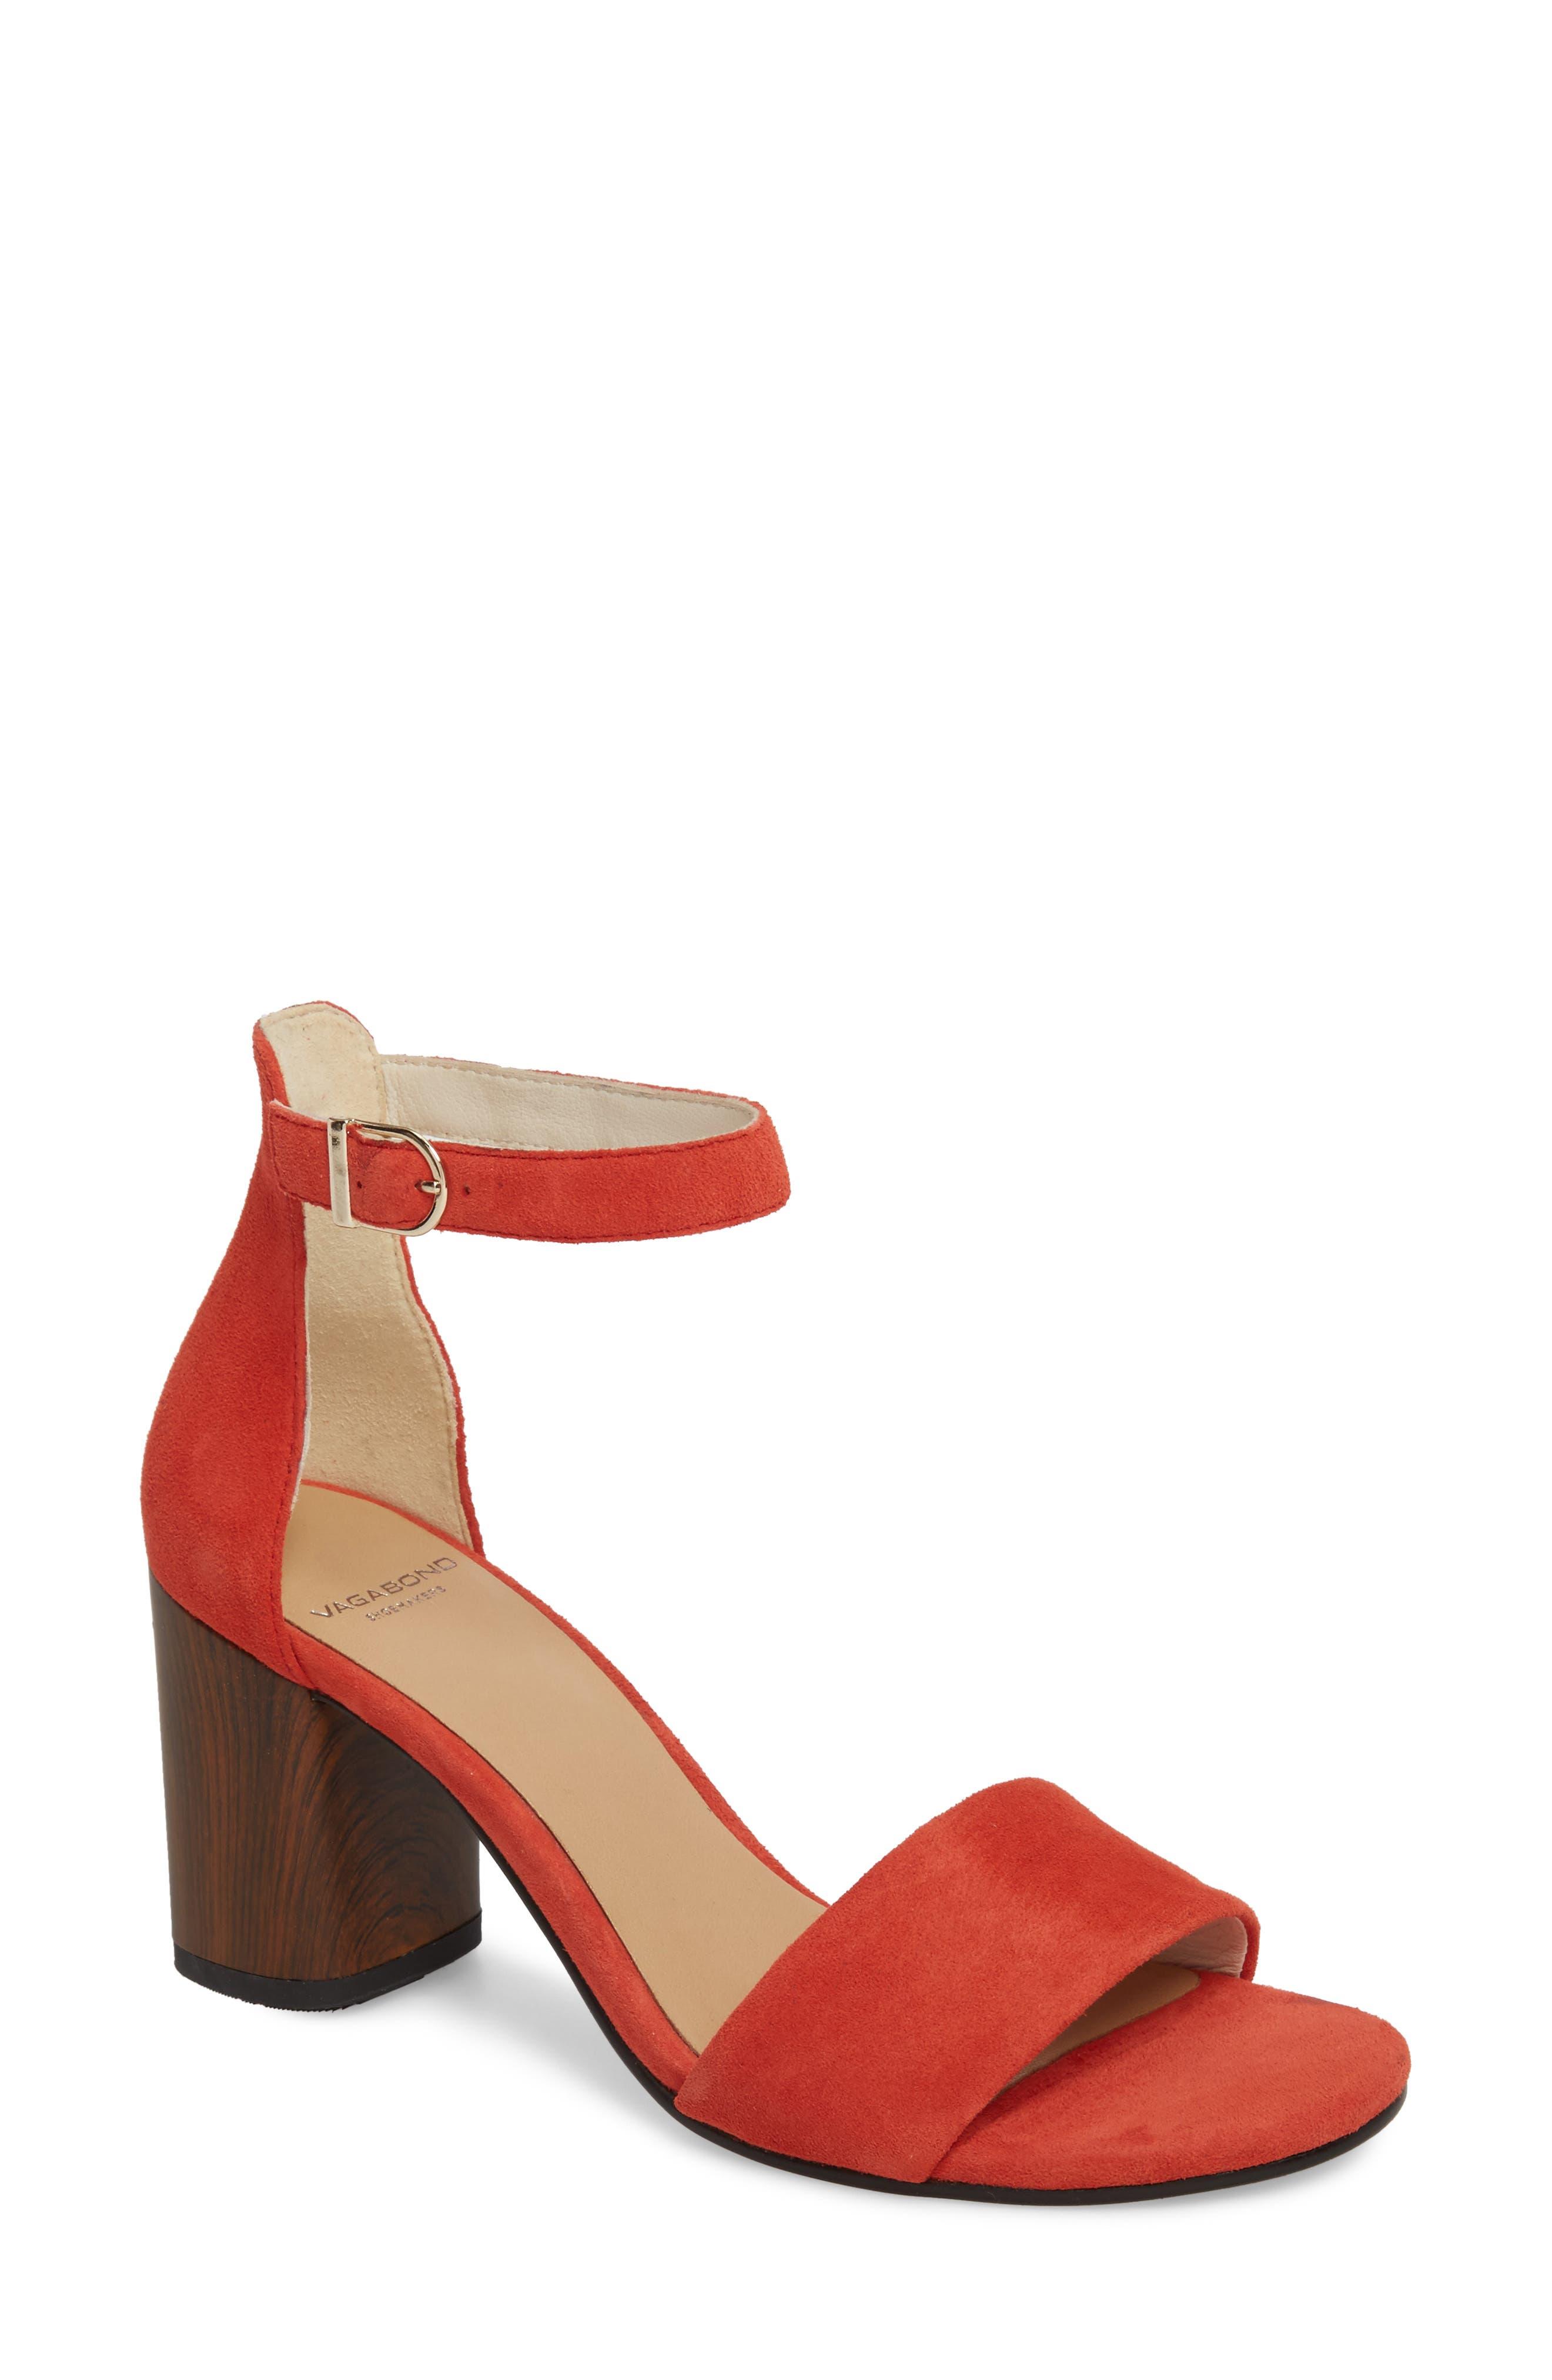 Vagabond Shoemakers Carol Ankle Strap Sandal